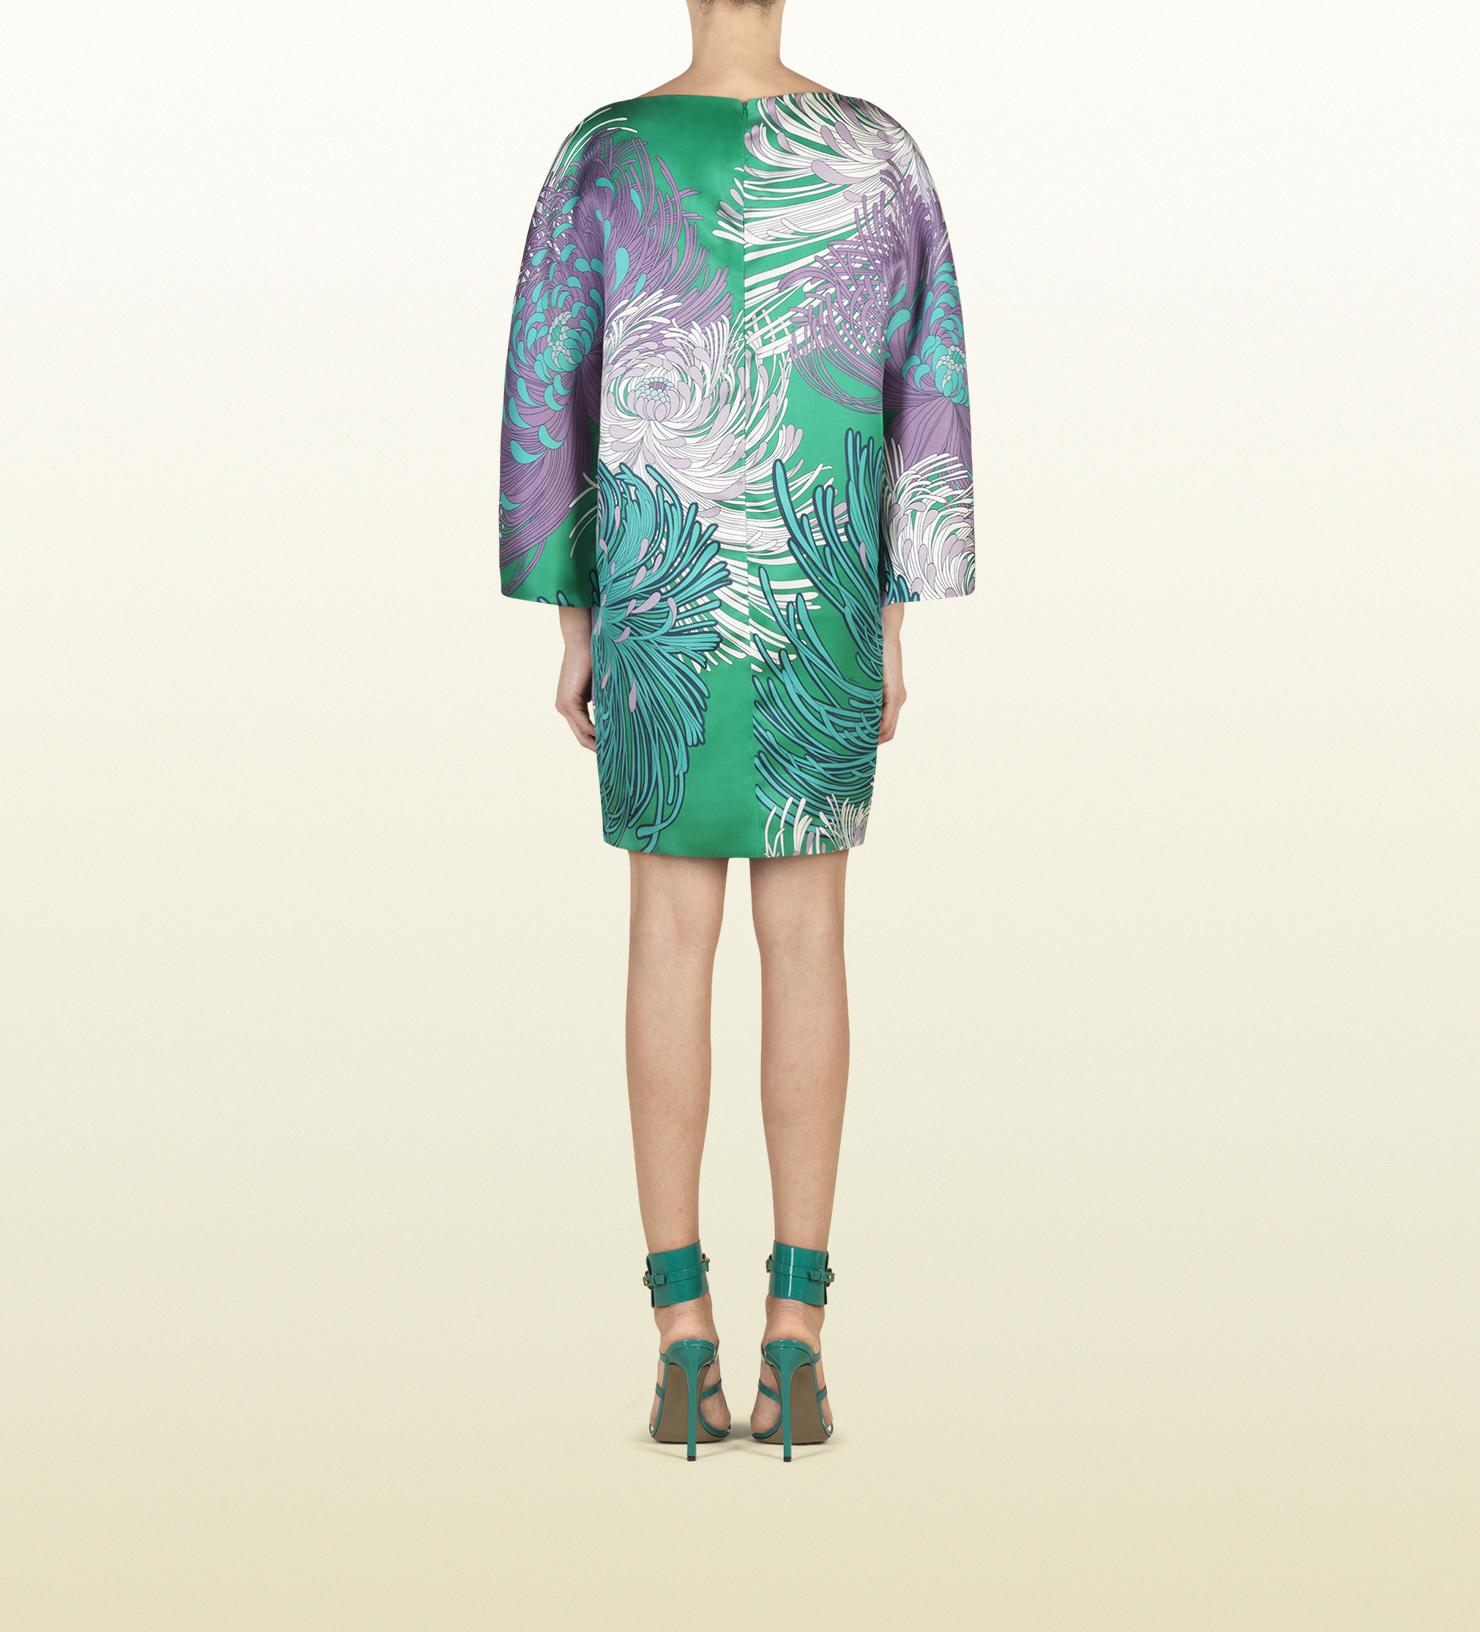 Lyst - Gucci Turquoise Green Dahlia Print Silk Oversized Dress